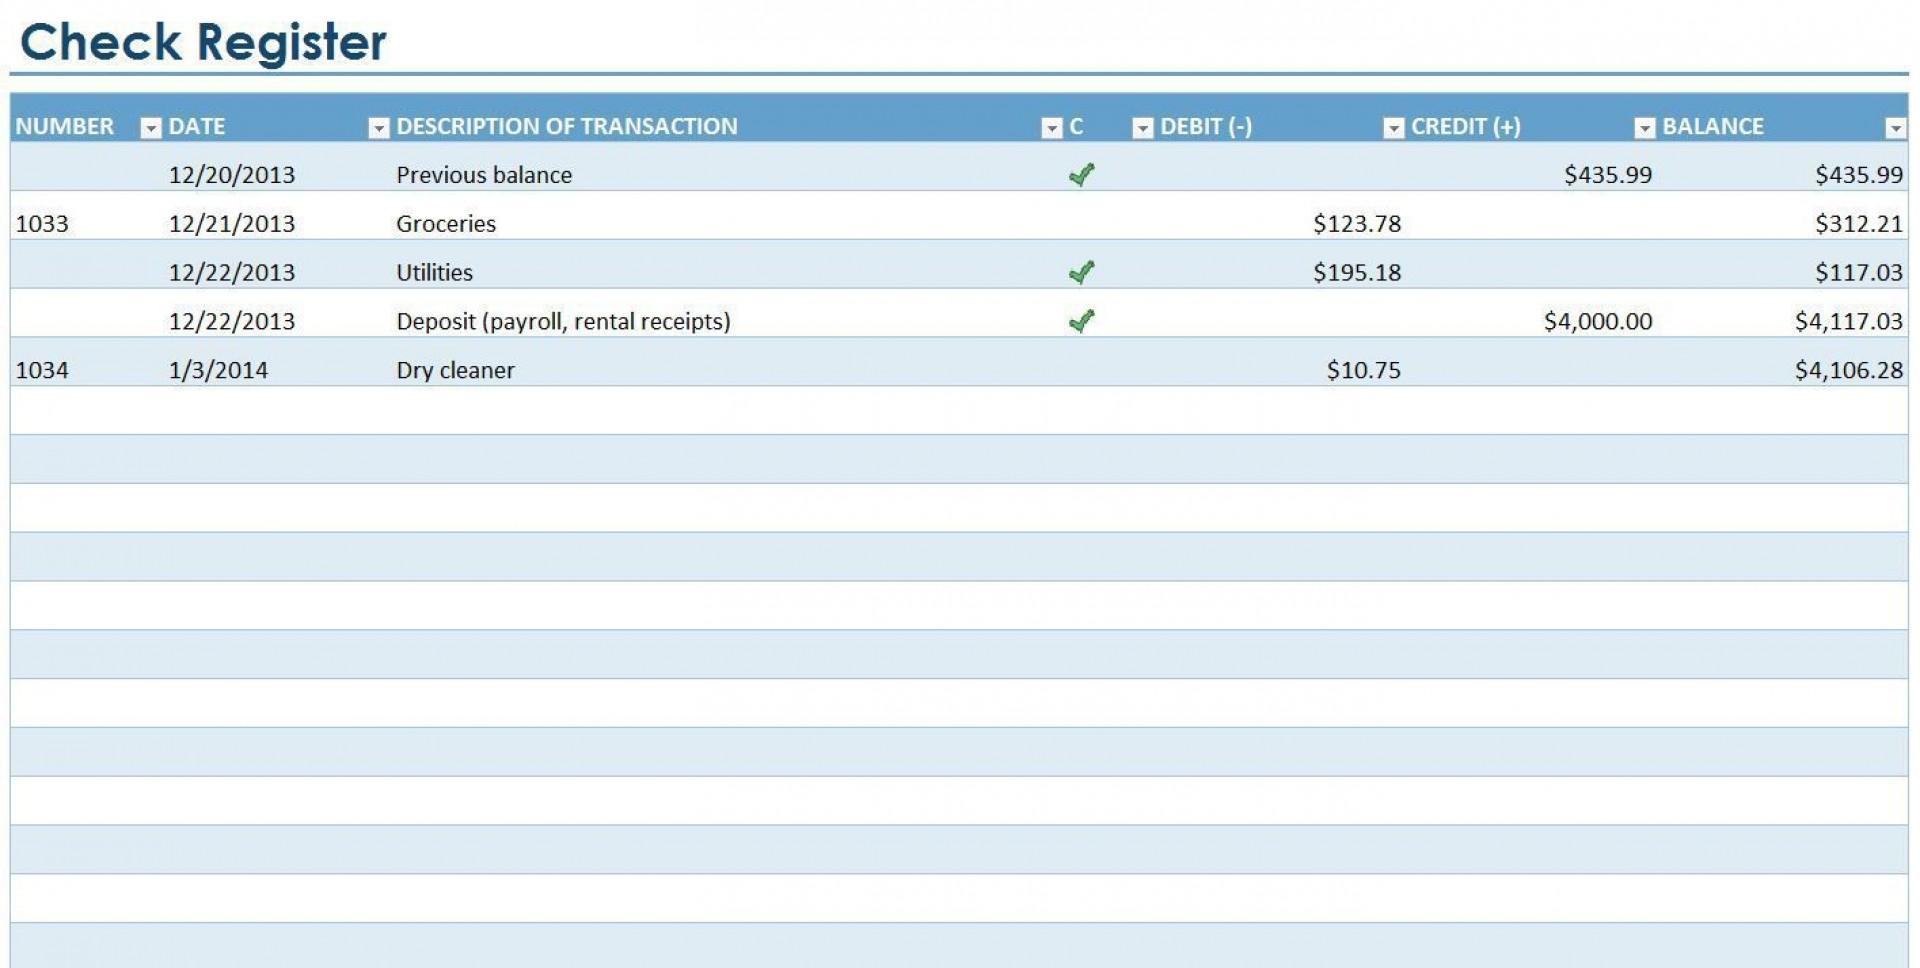 007 Excellent Checkbook Register Template Excel 2013 Highest Quality 1920